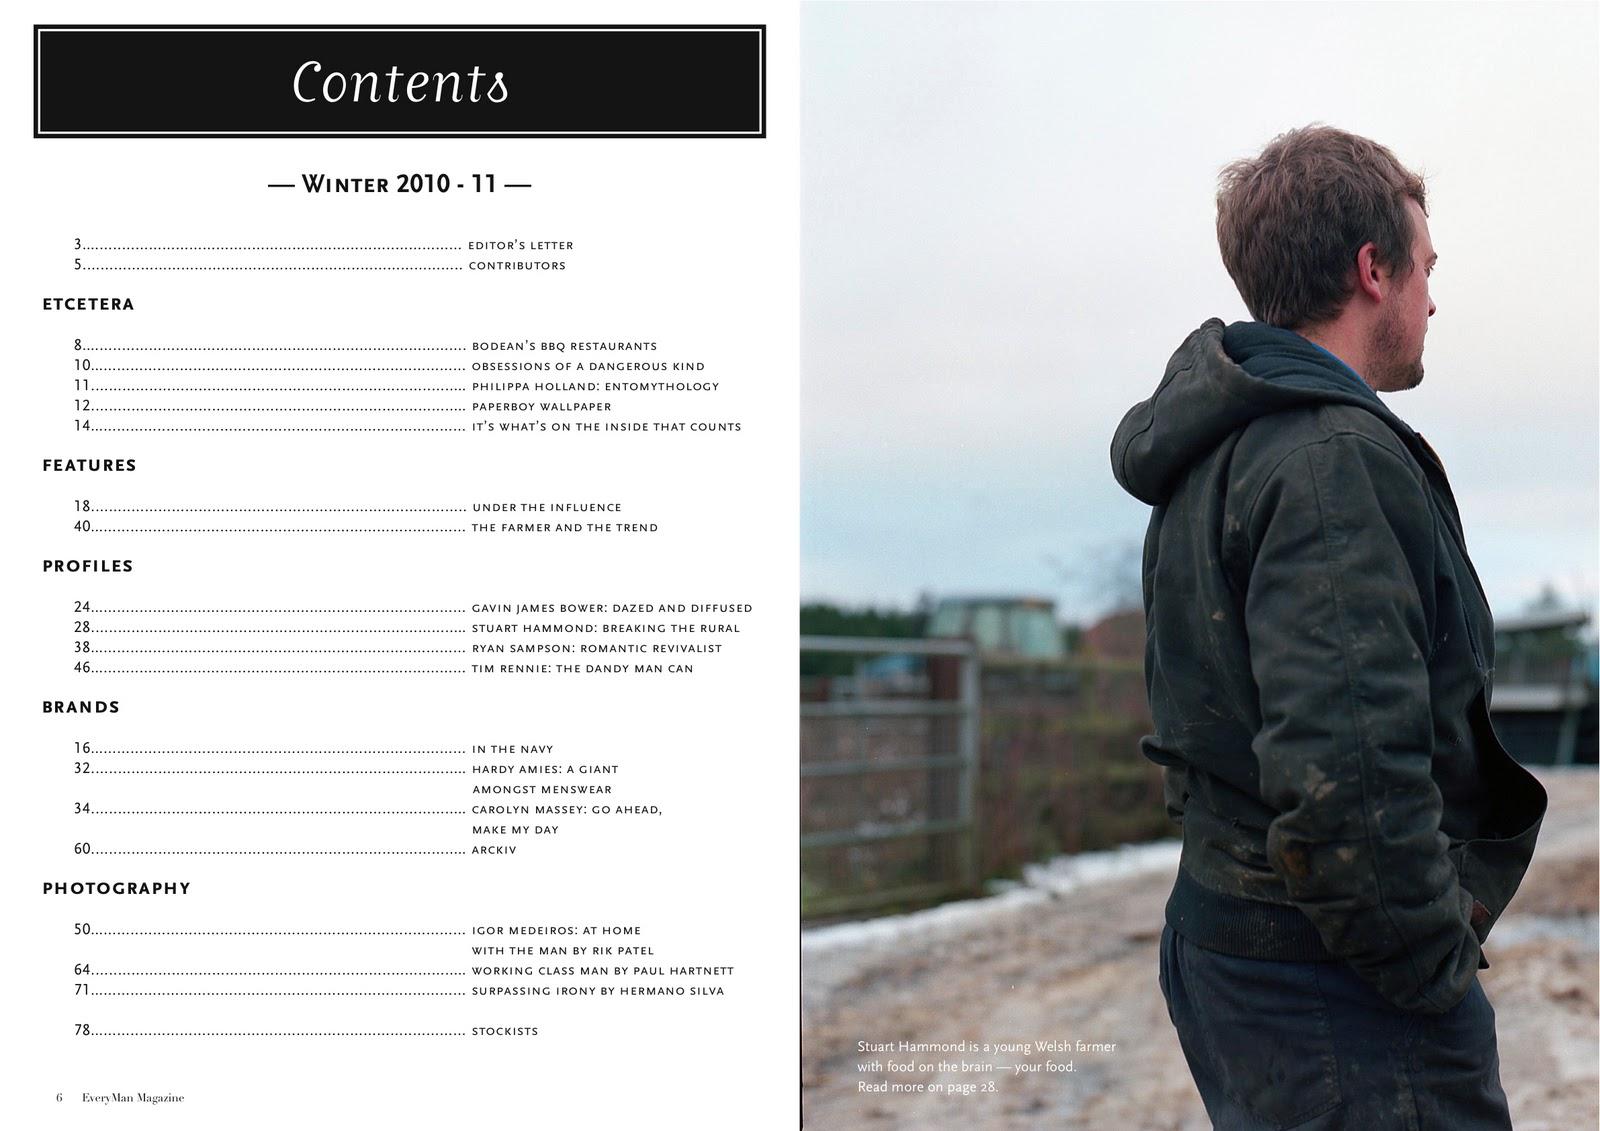 contentspage.jpg